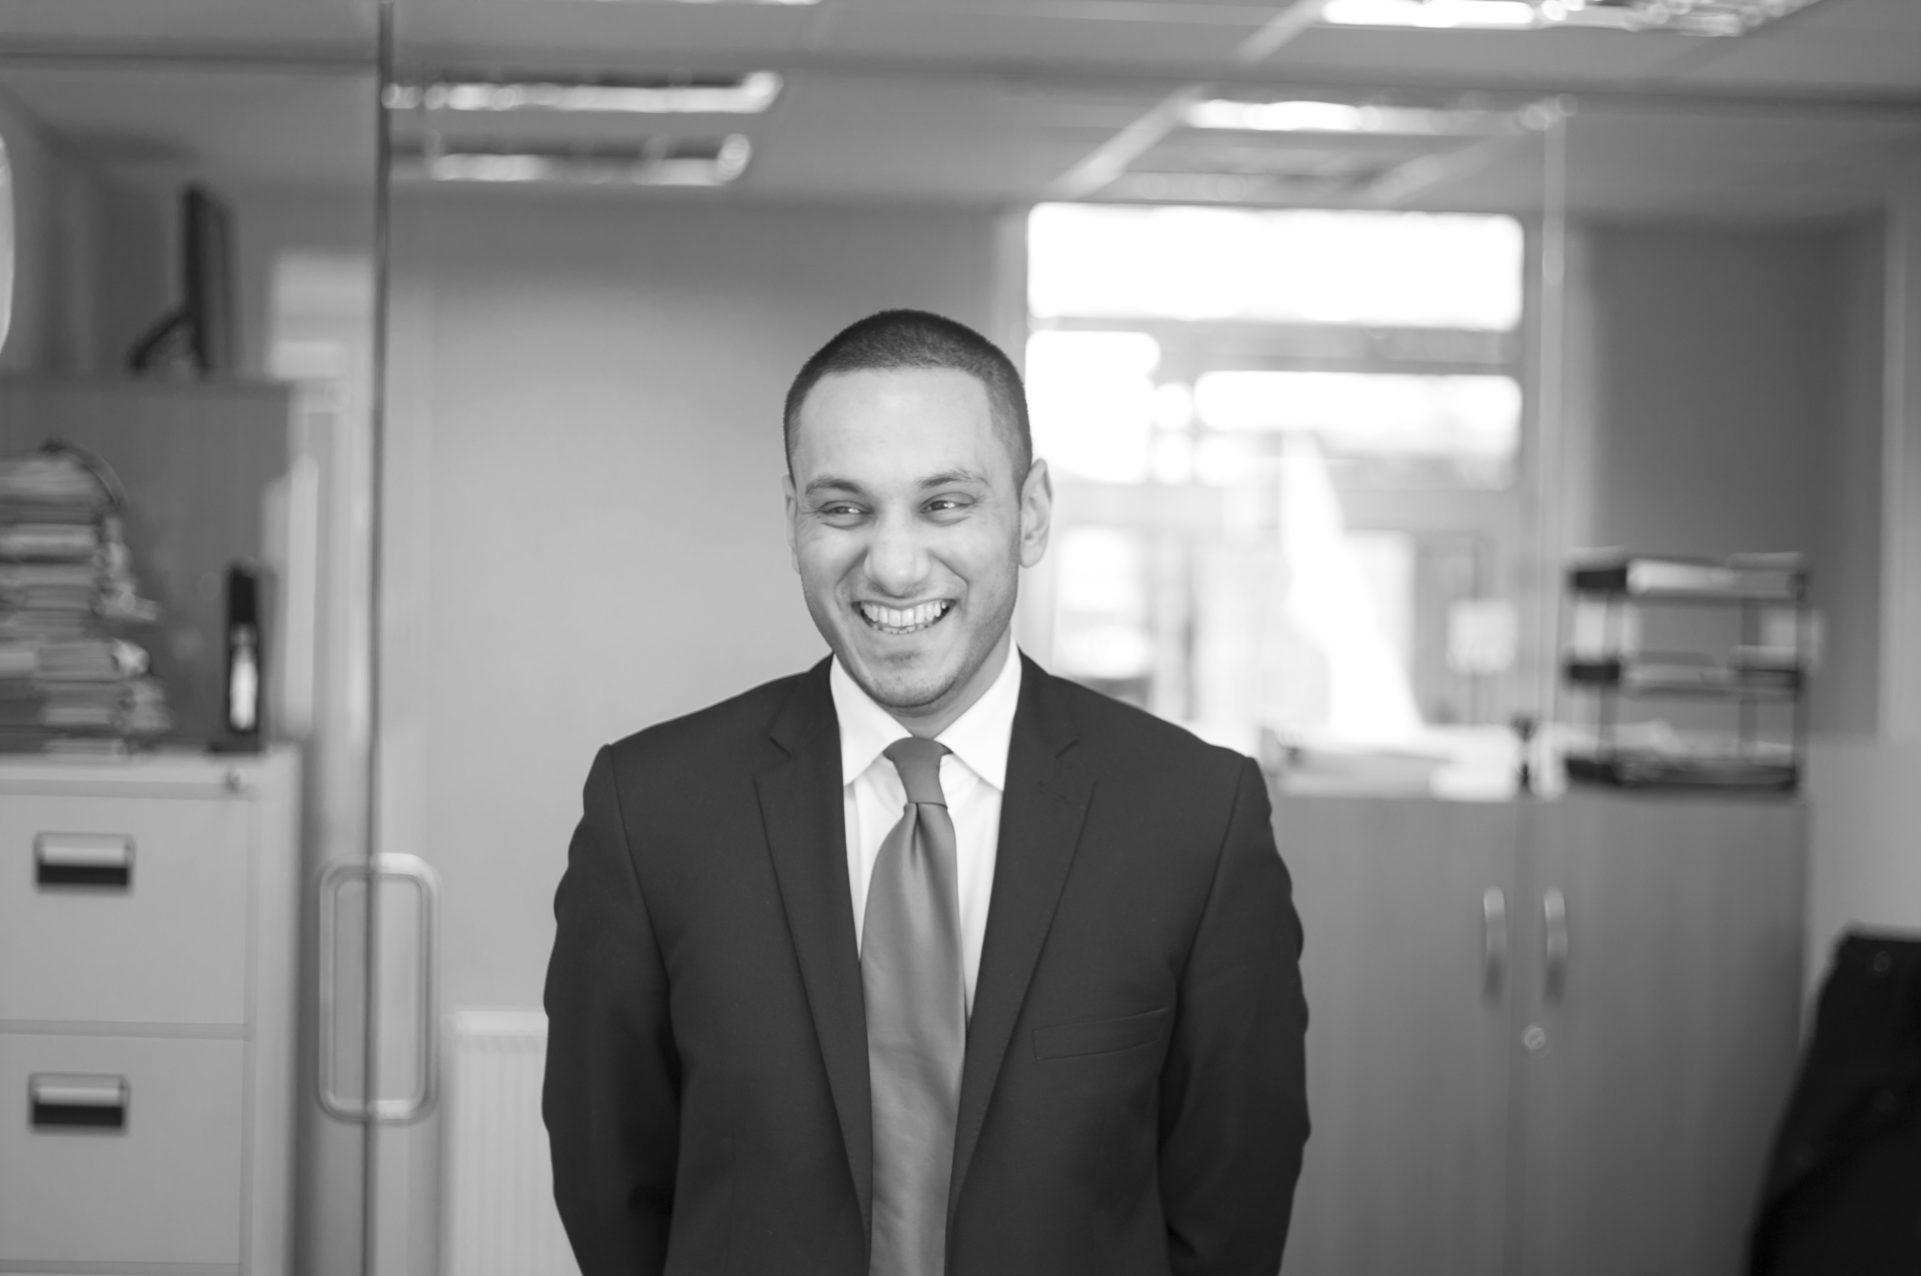 Anees Rehman - Hillsborough Office Manager & Residential Conveyancer